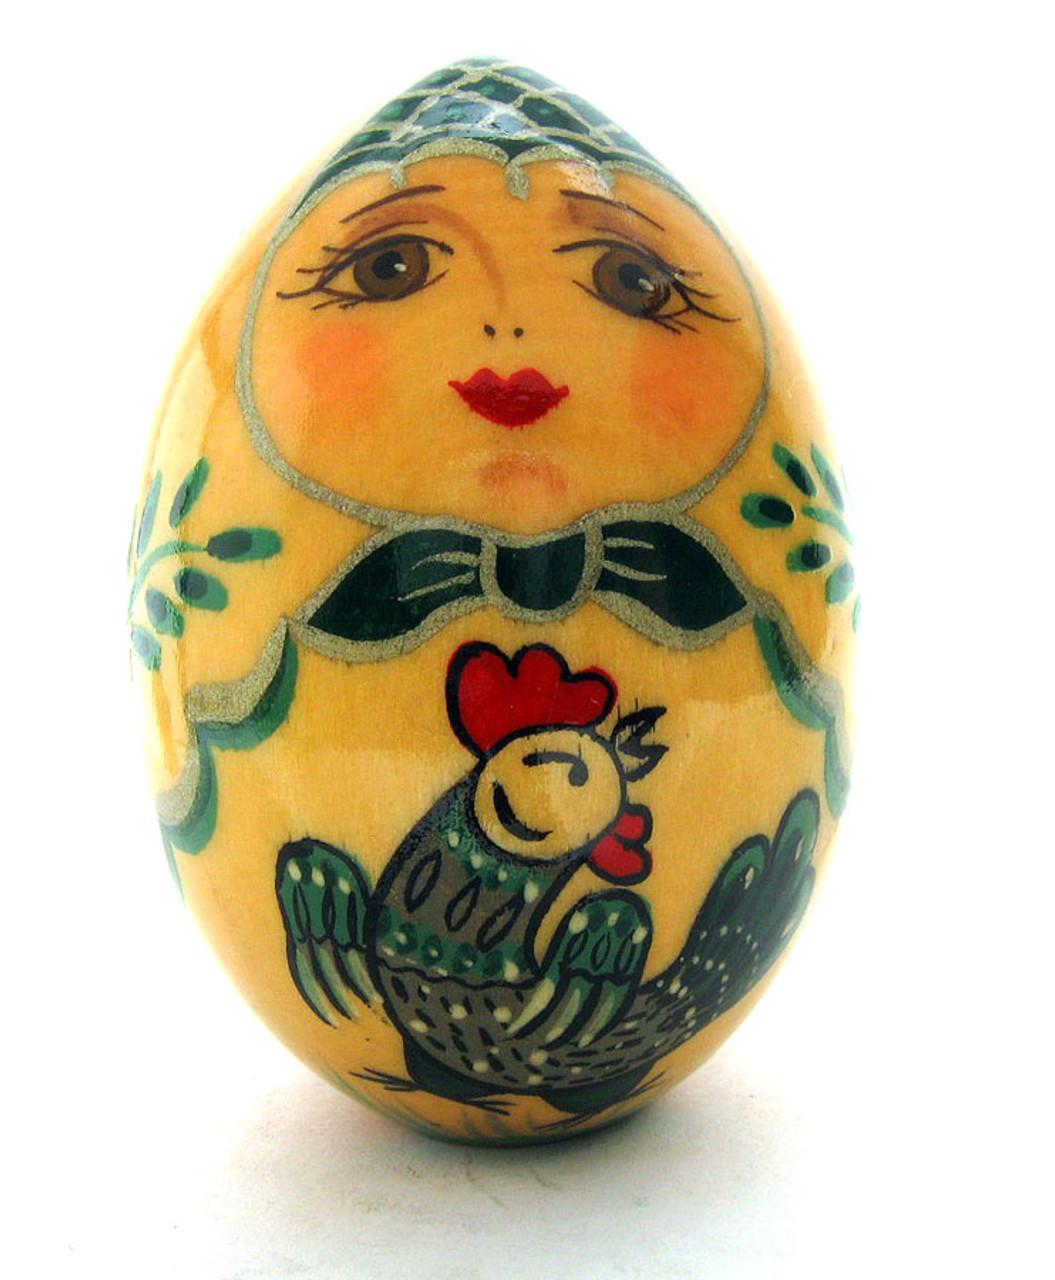 Easter Egg Girl with Cockerel (Девушка с Петушком) front view